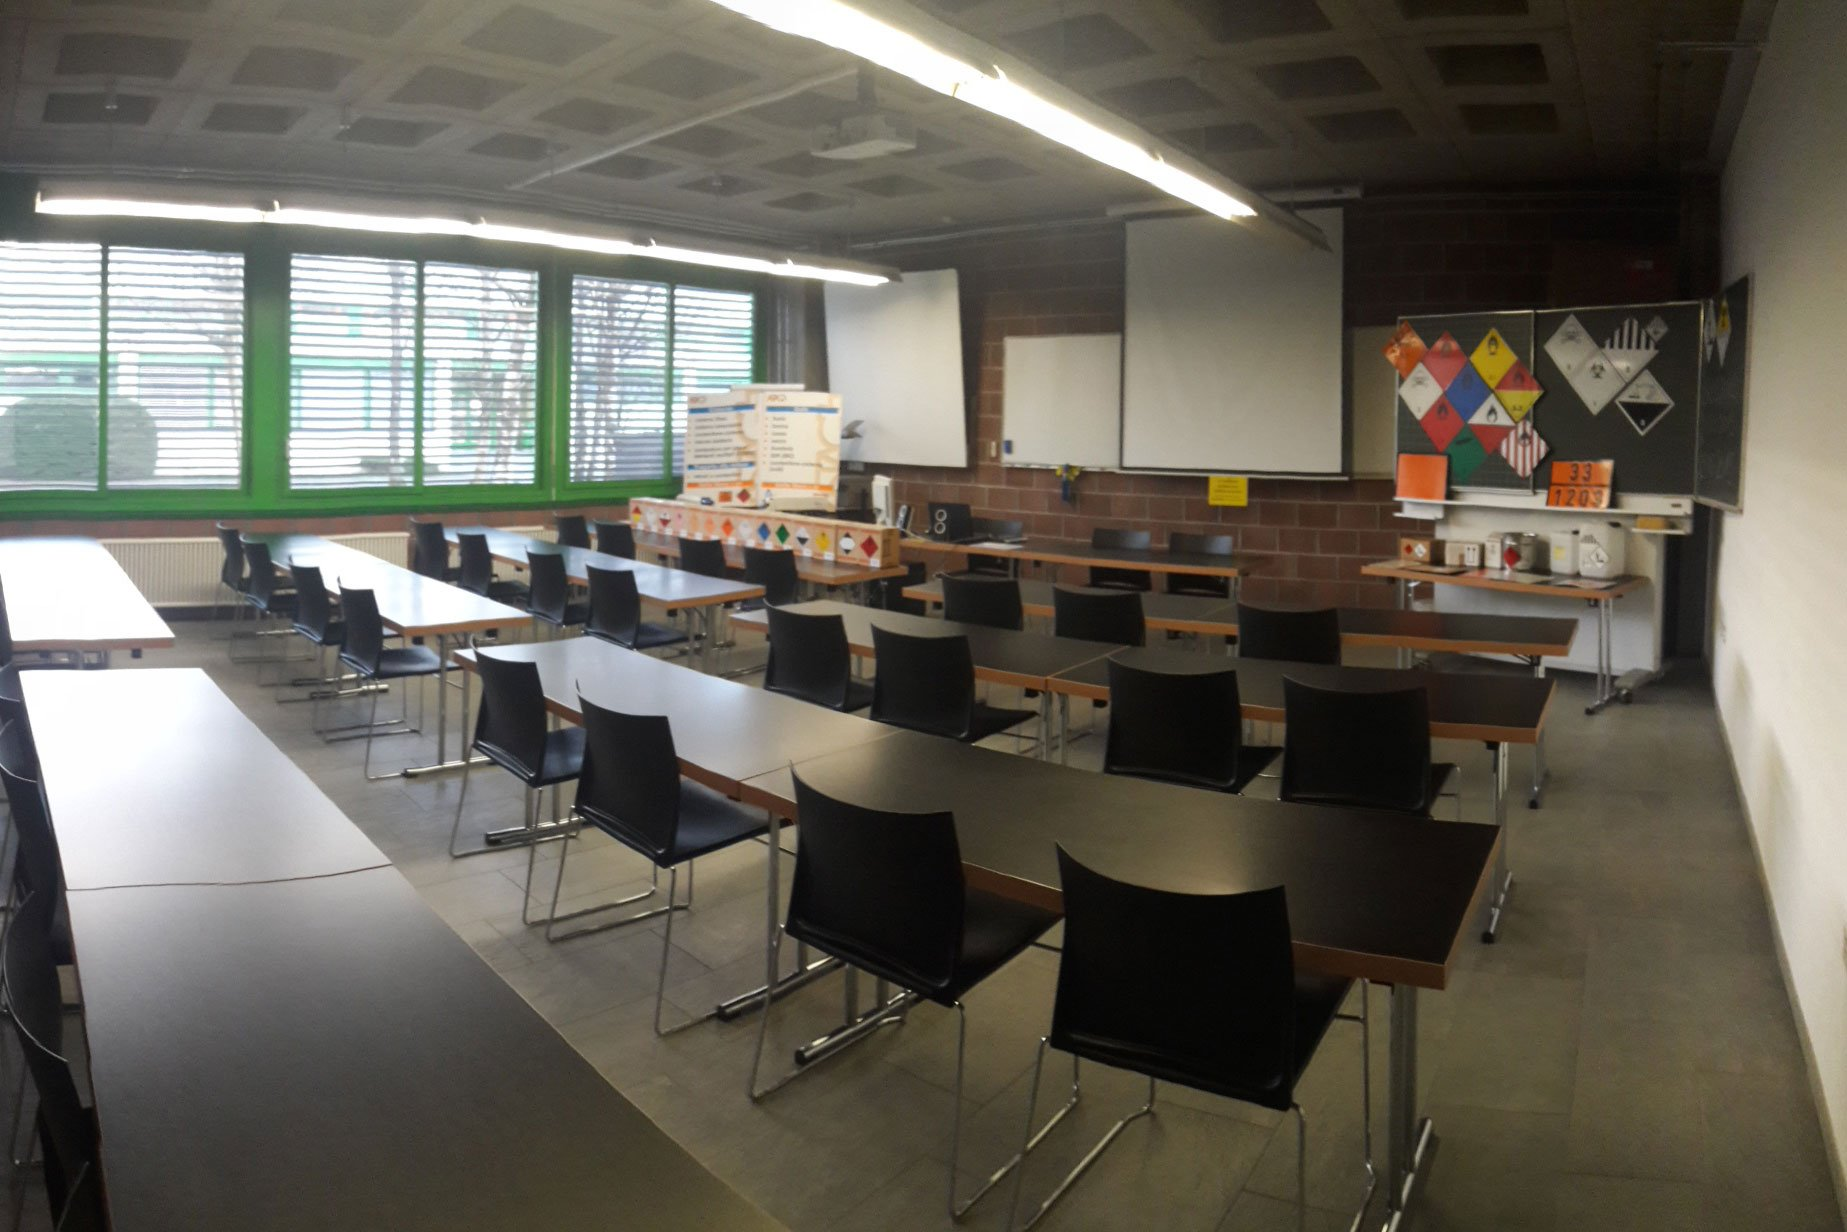 ssic-cfp-gordola-infrastrutture-aula-07